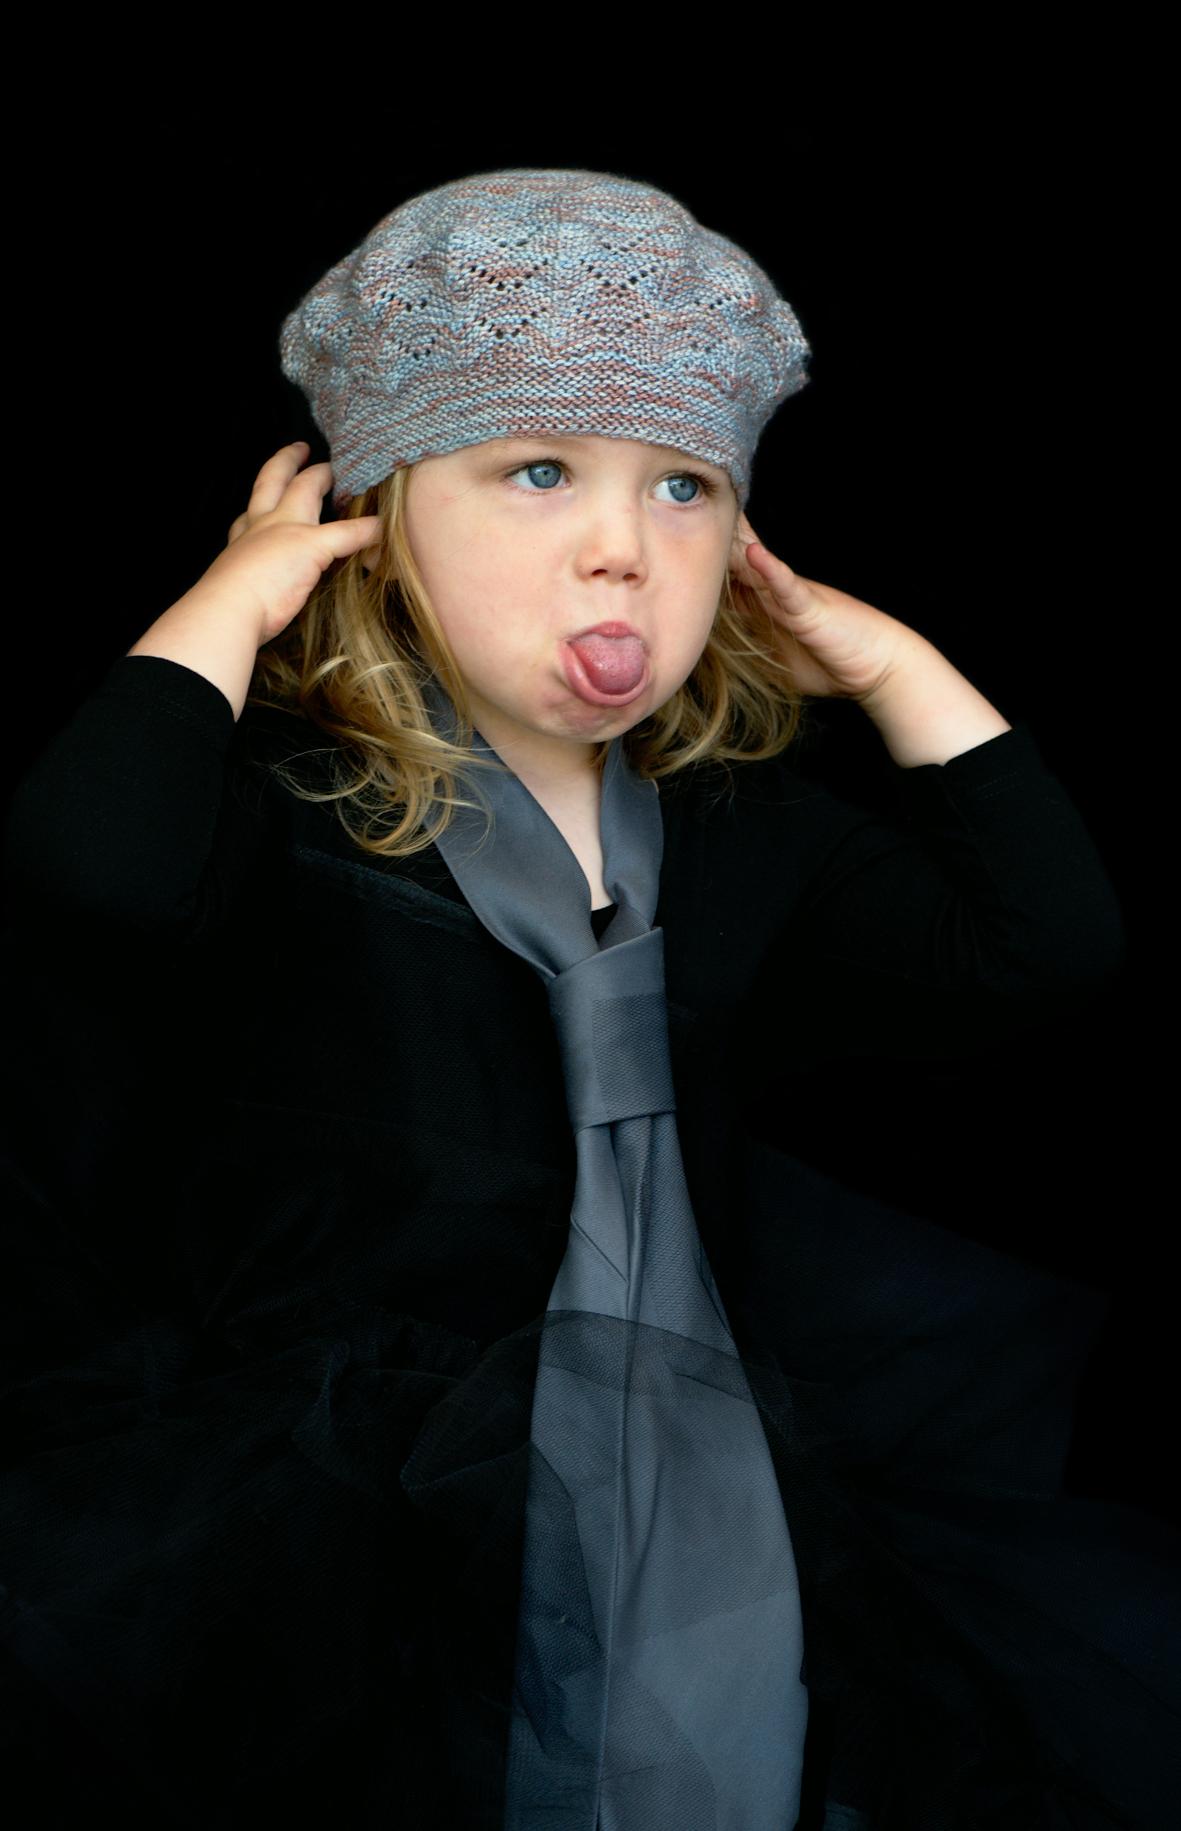 Kilbride hand knitting pattern for a beret